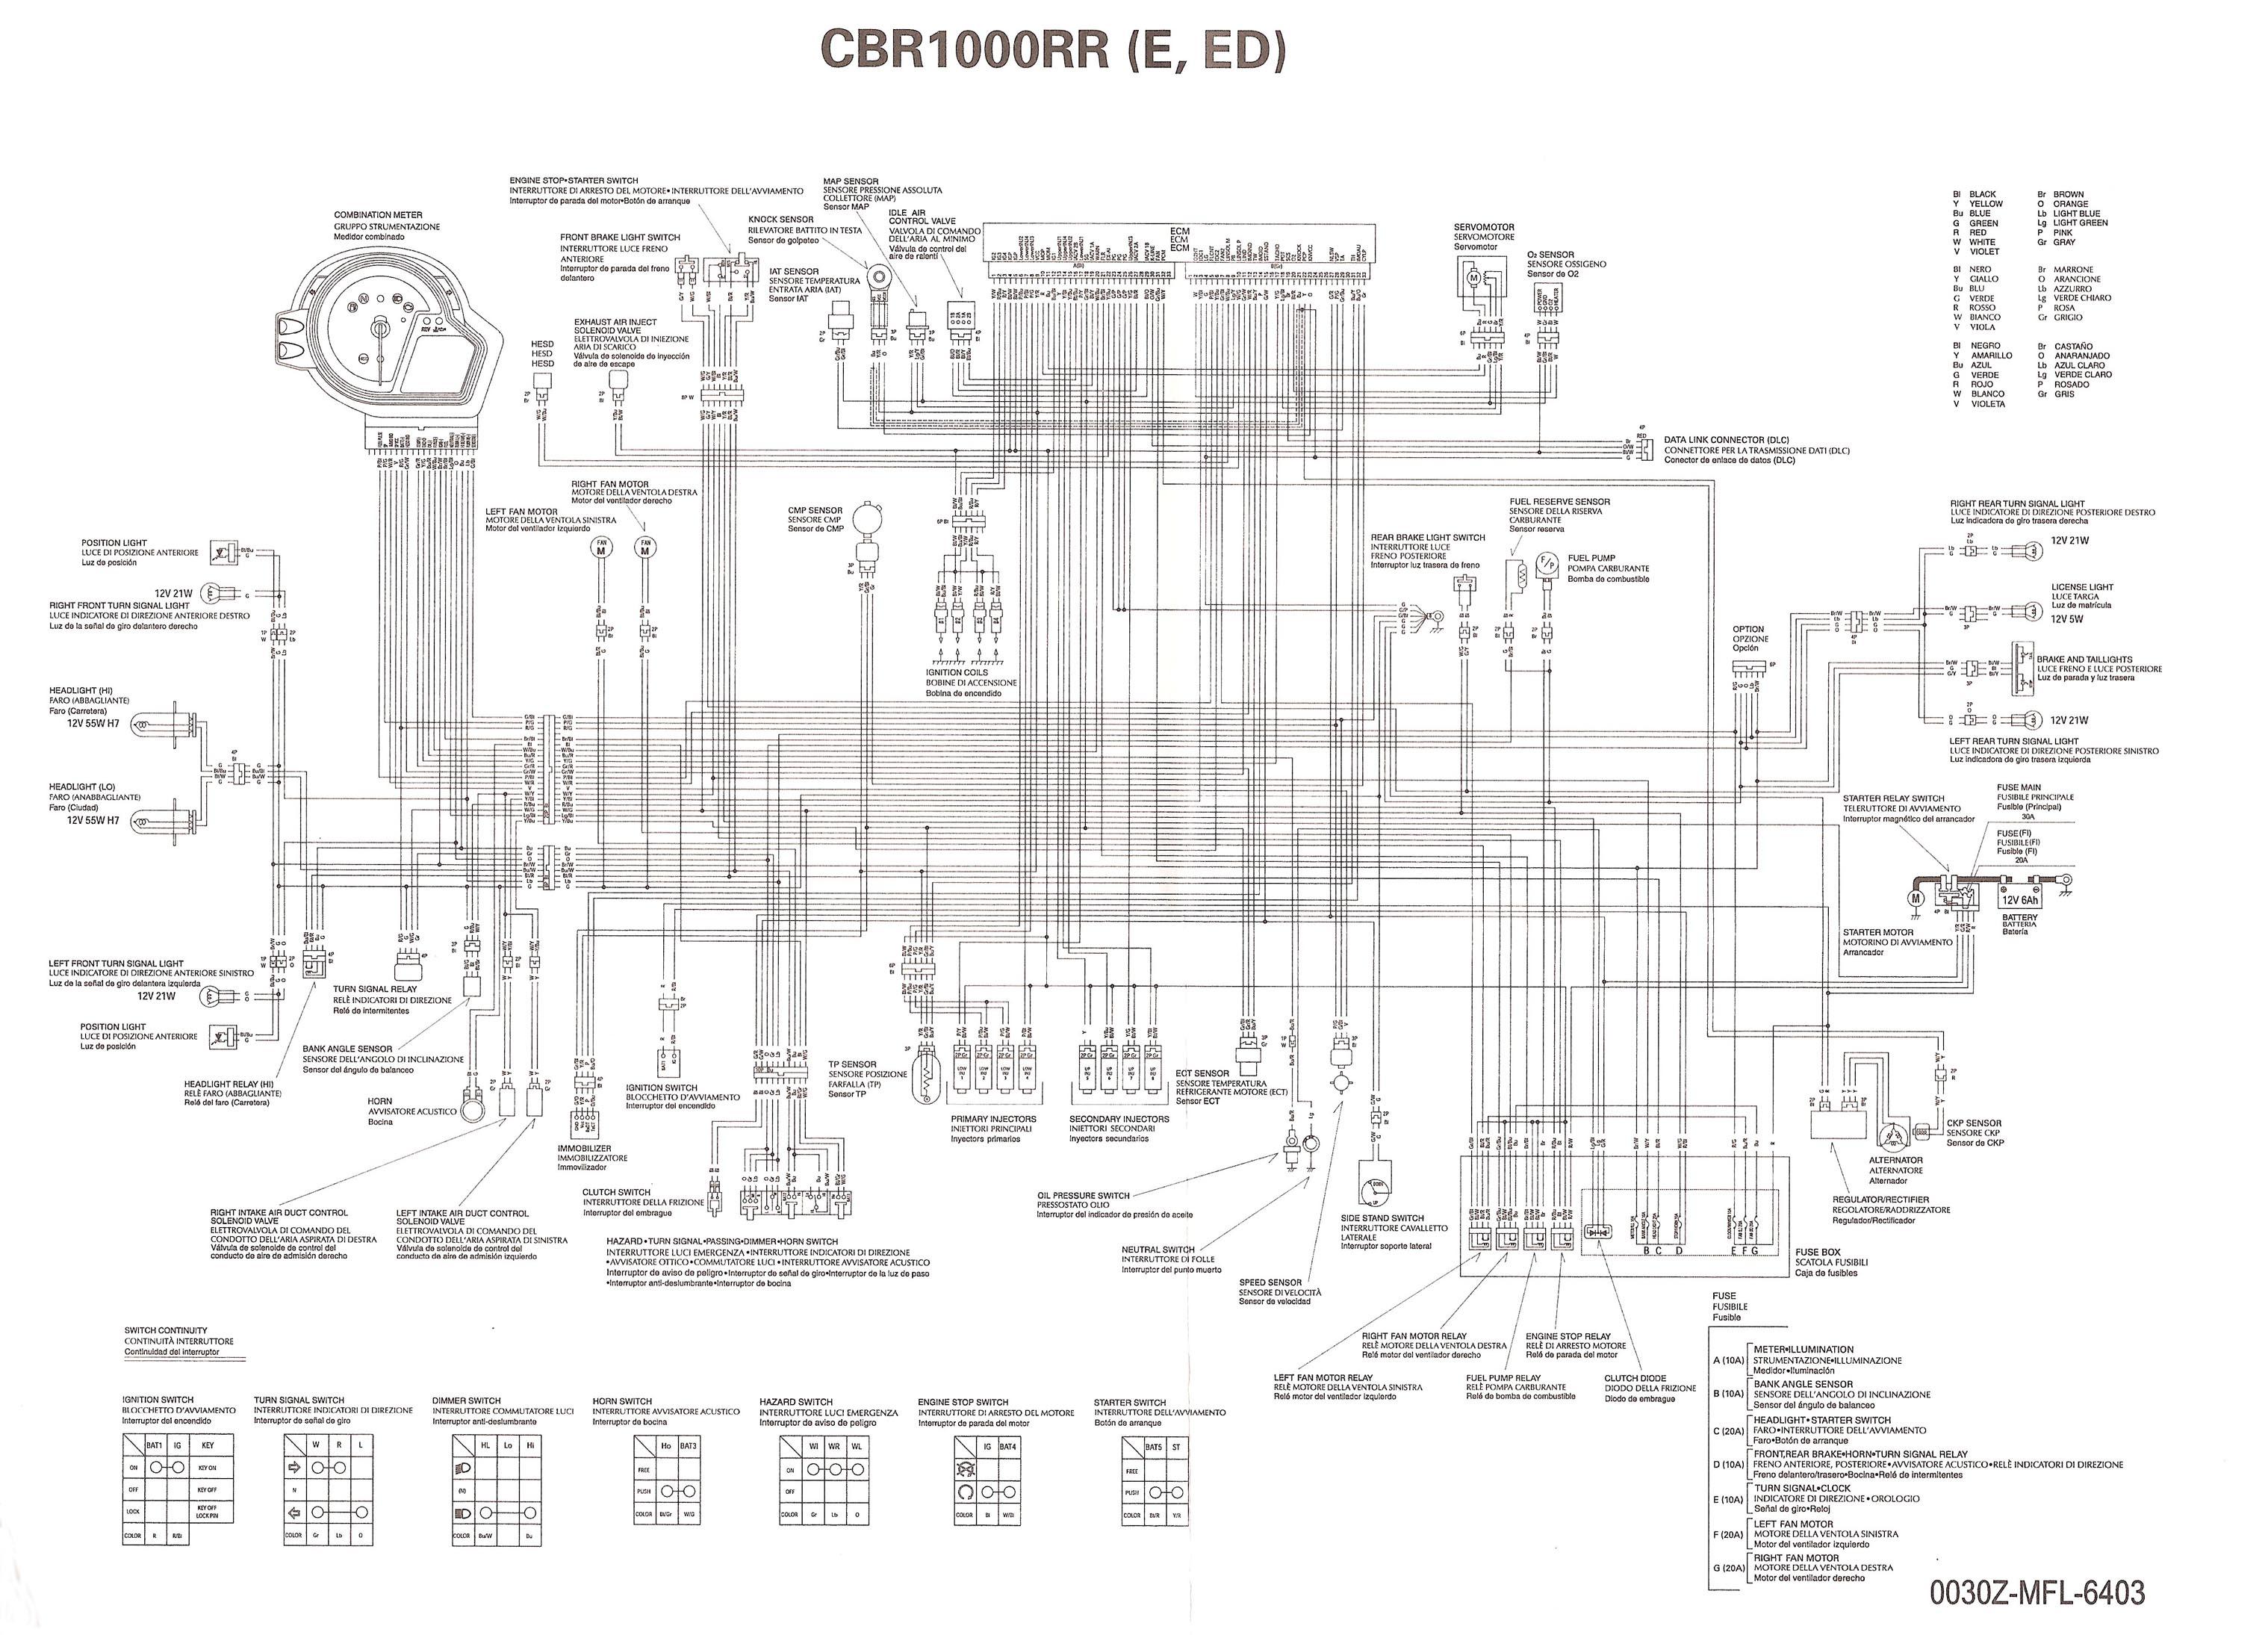 2000 Suzuki Esteem Fuse Box Diagram Another Wiring Diagrams On A 2005 Forenza Worksheet And U2022 Rh Bookinc Co 2002 Xl7 2003 Aerio